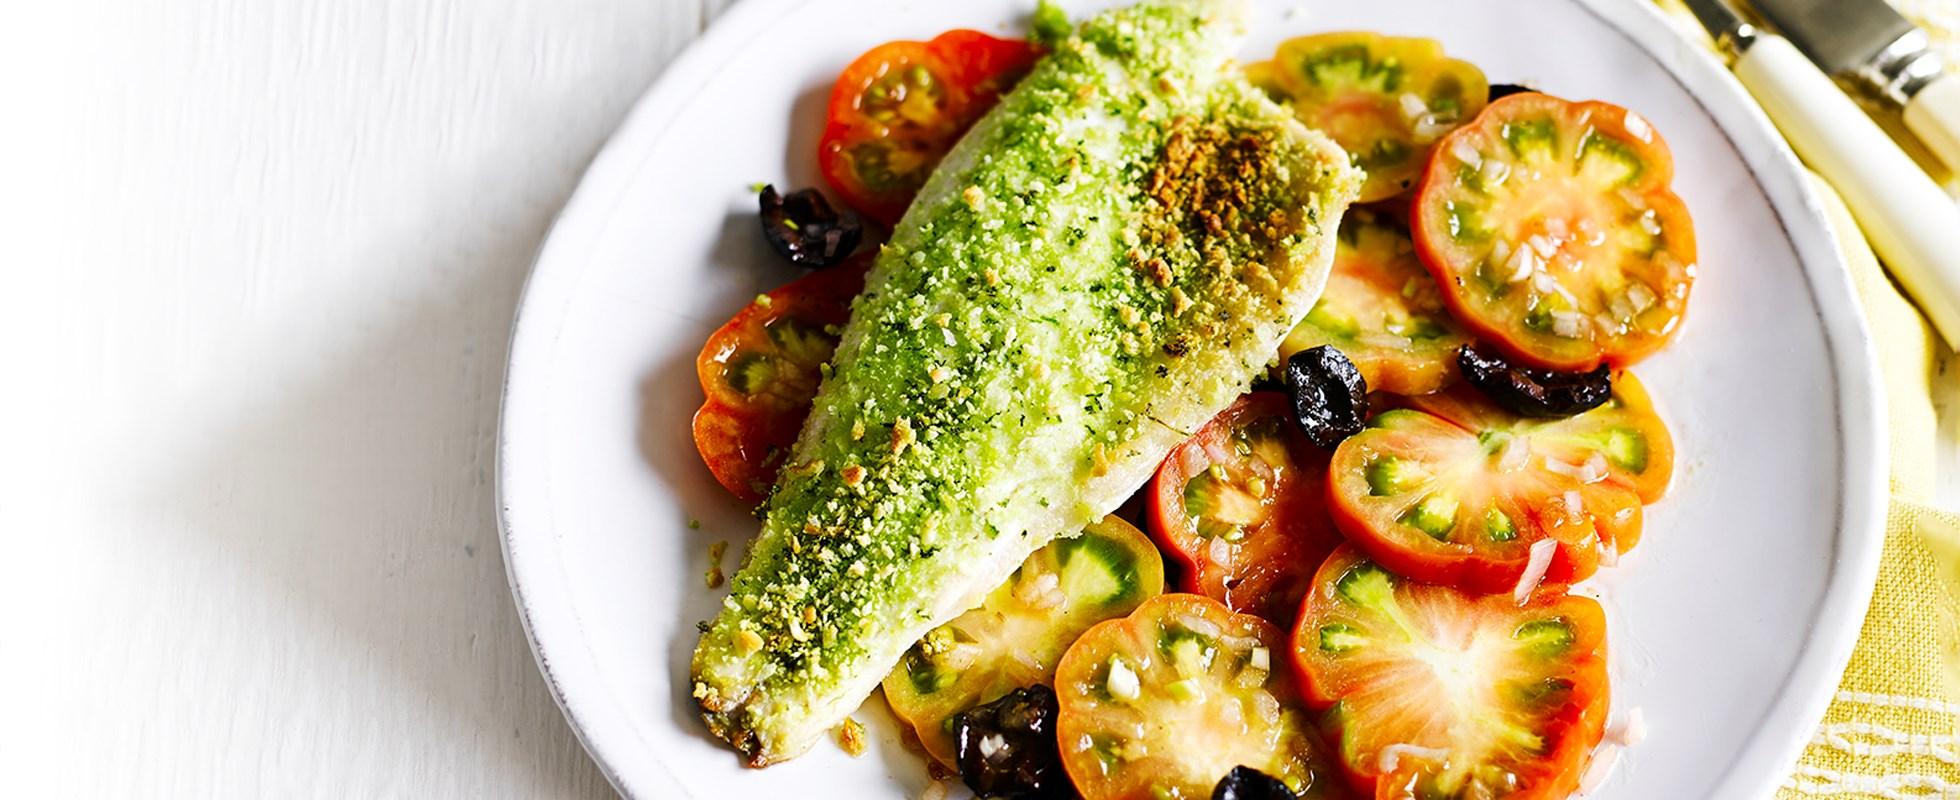 Basil panko-crusted sea bass with tomato salad